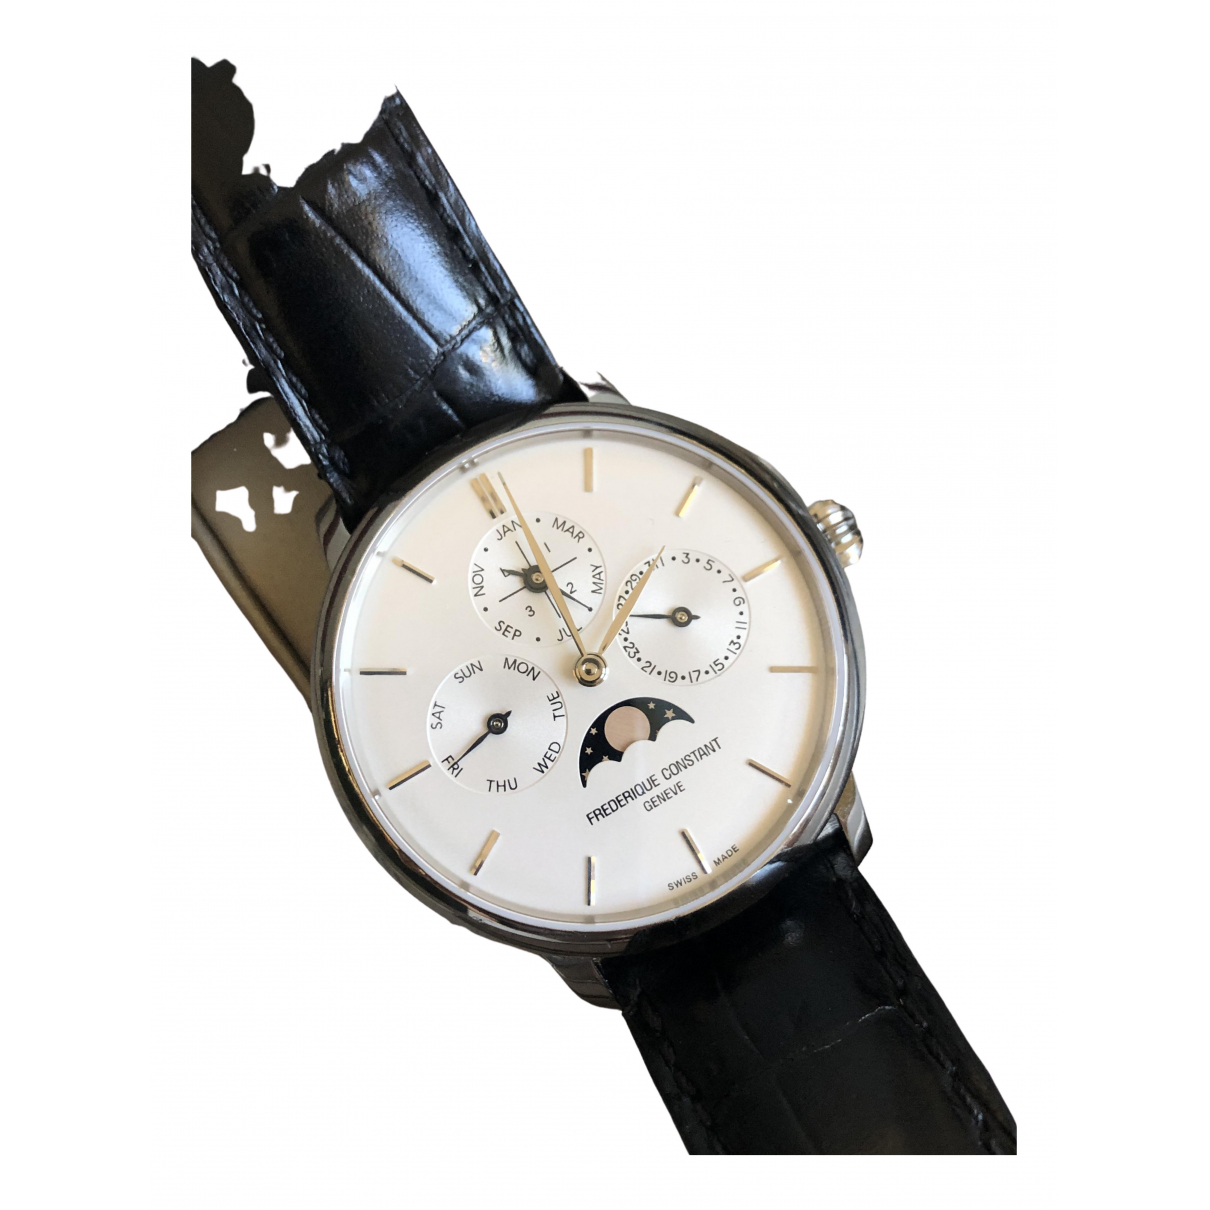 Frederique Constant SlimLine Manufacture Phase de Lune Uhr in  Silber Stahl